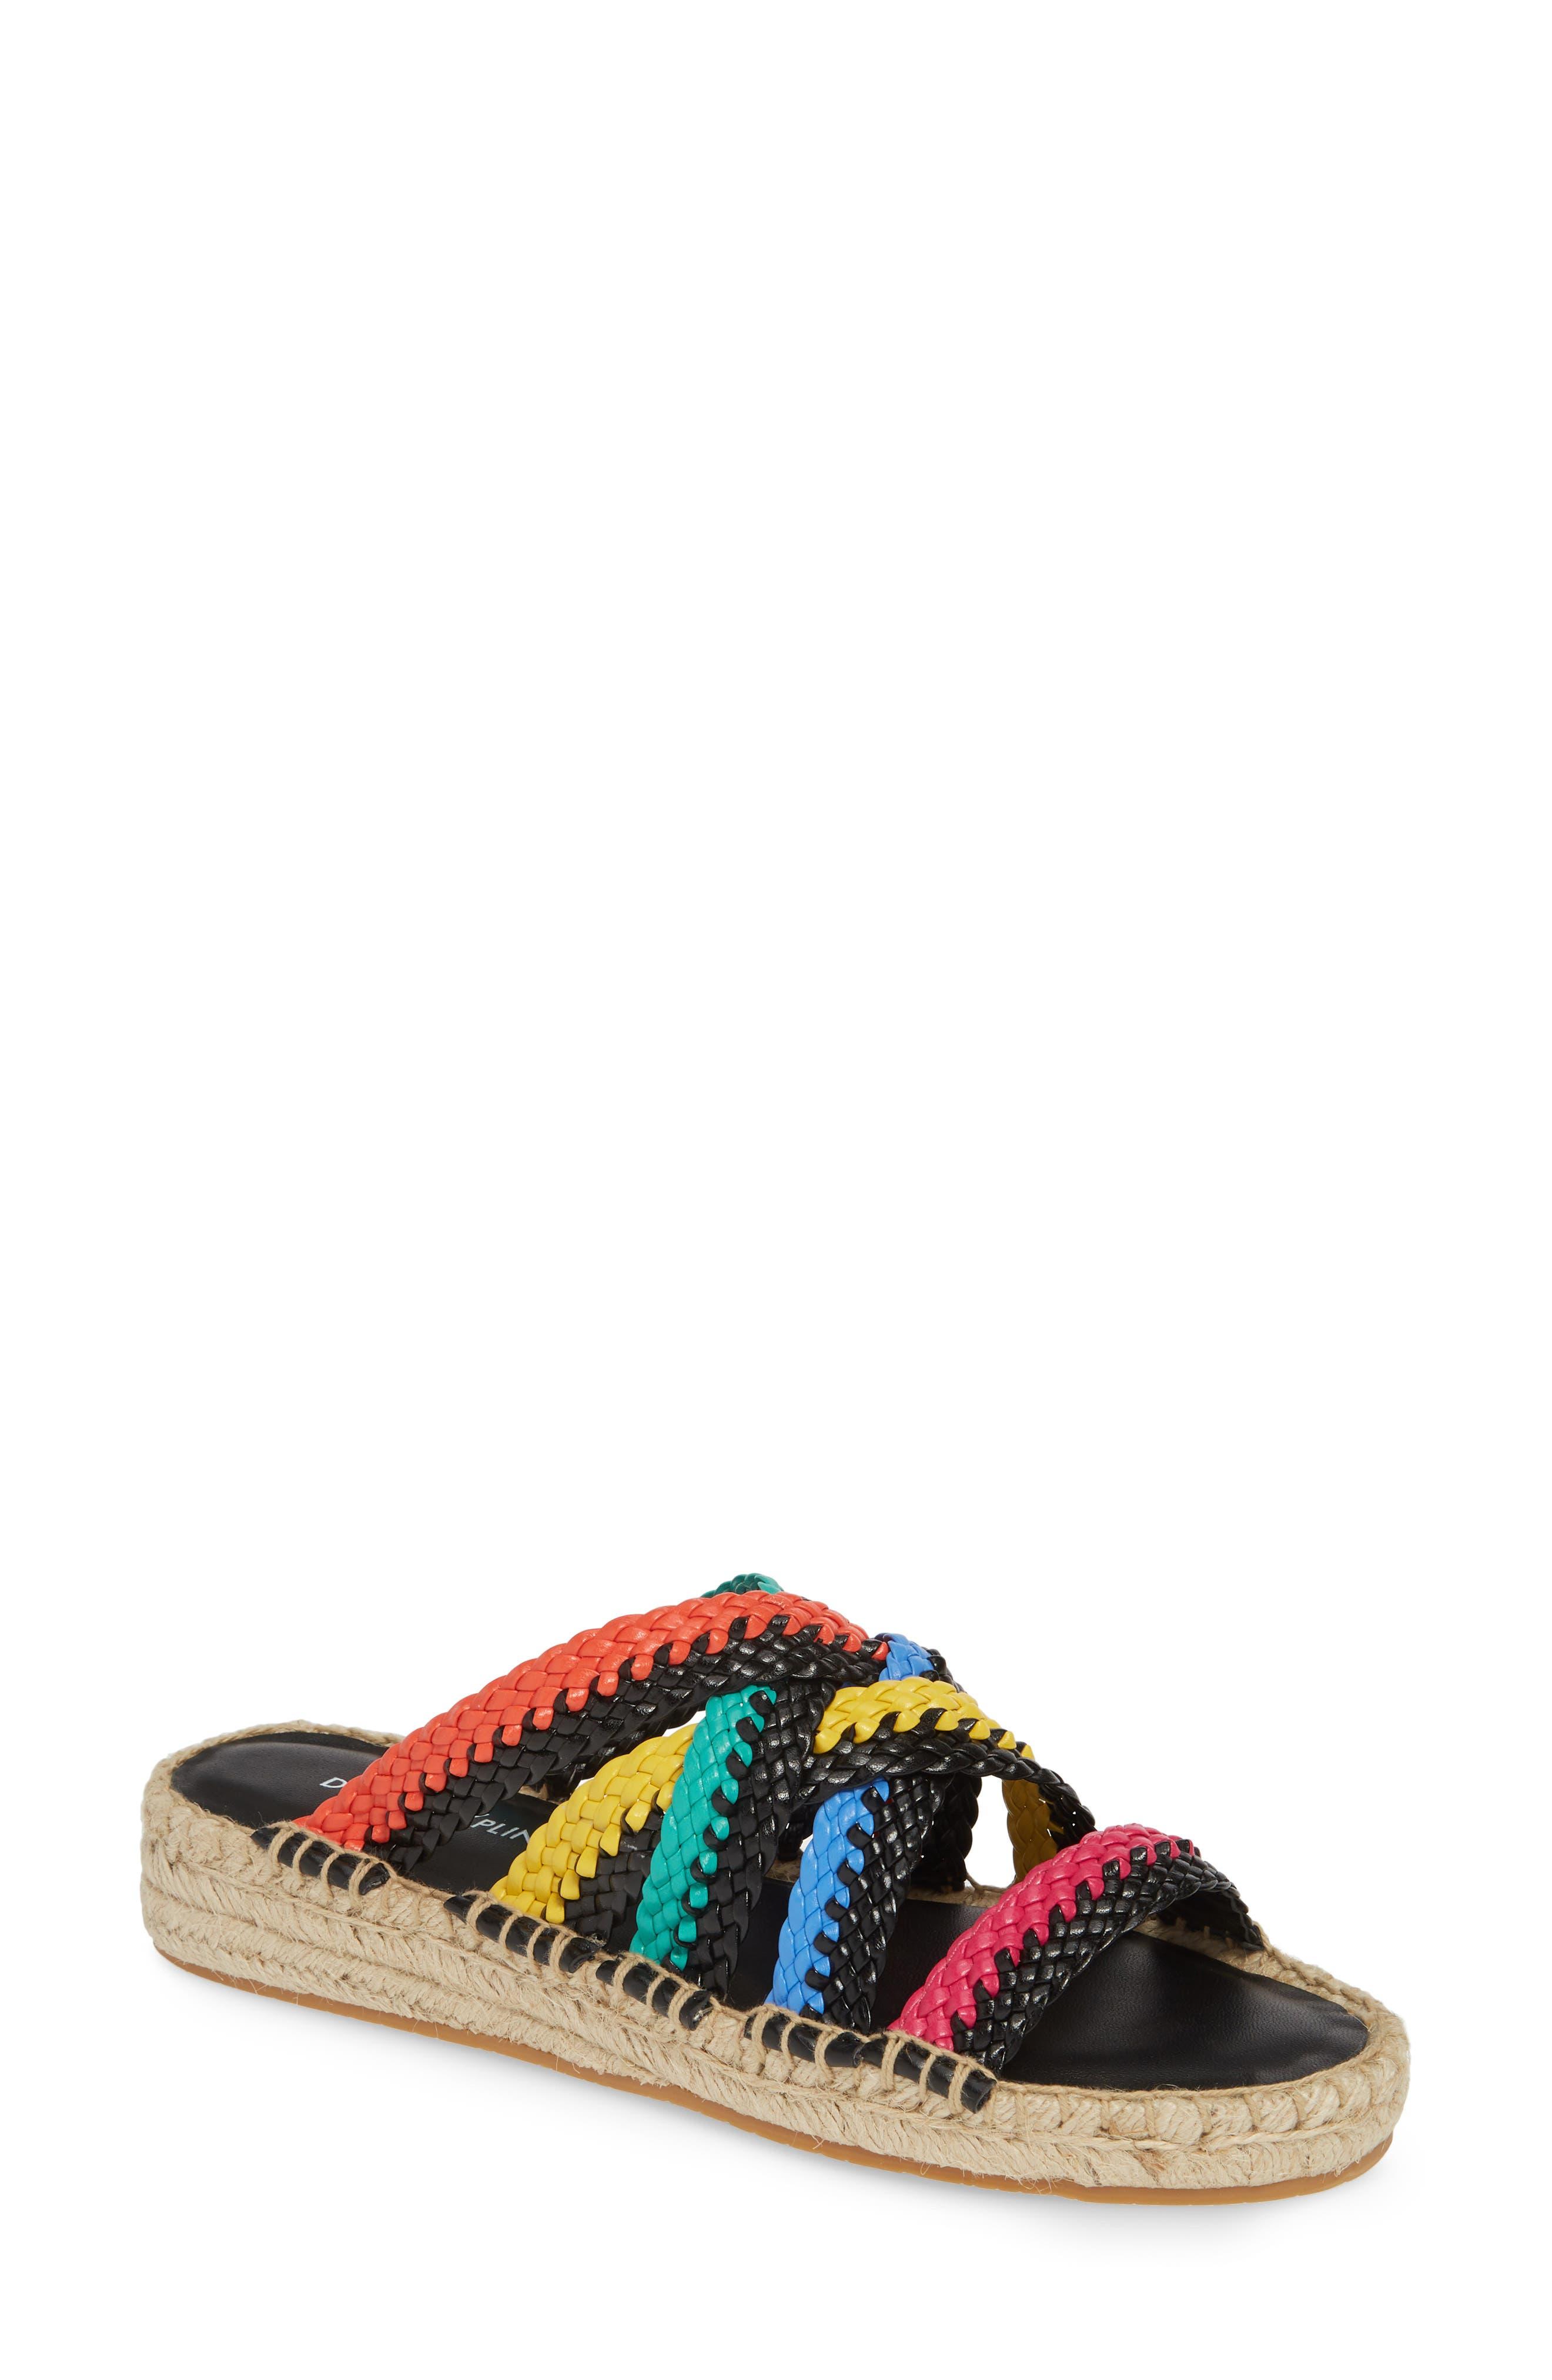 Rhonda Woven Espadrille Slide Sandal, Main, color, BLACK MULTI LEATHER